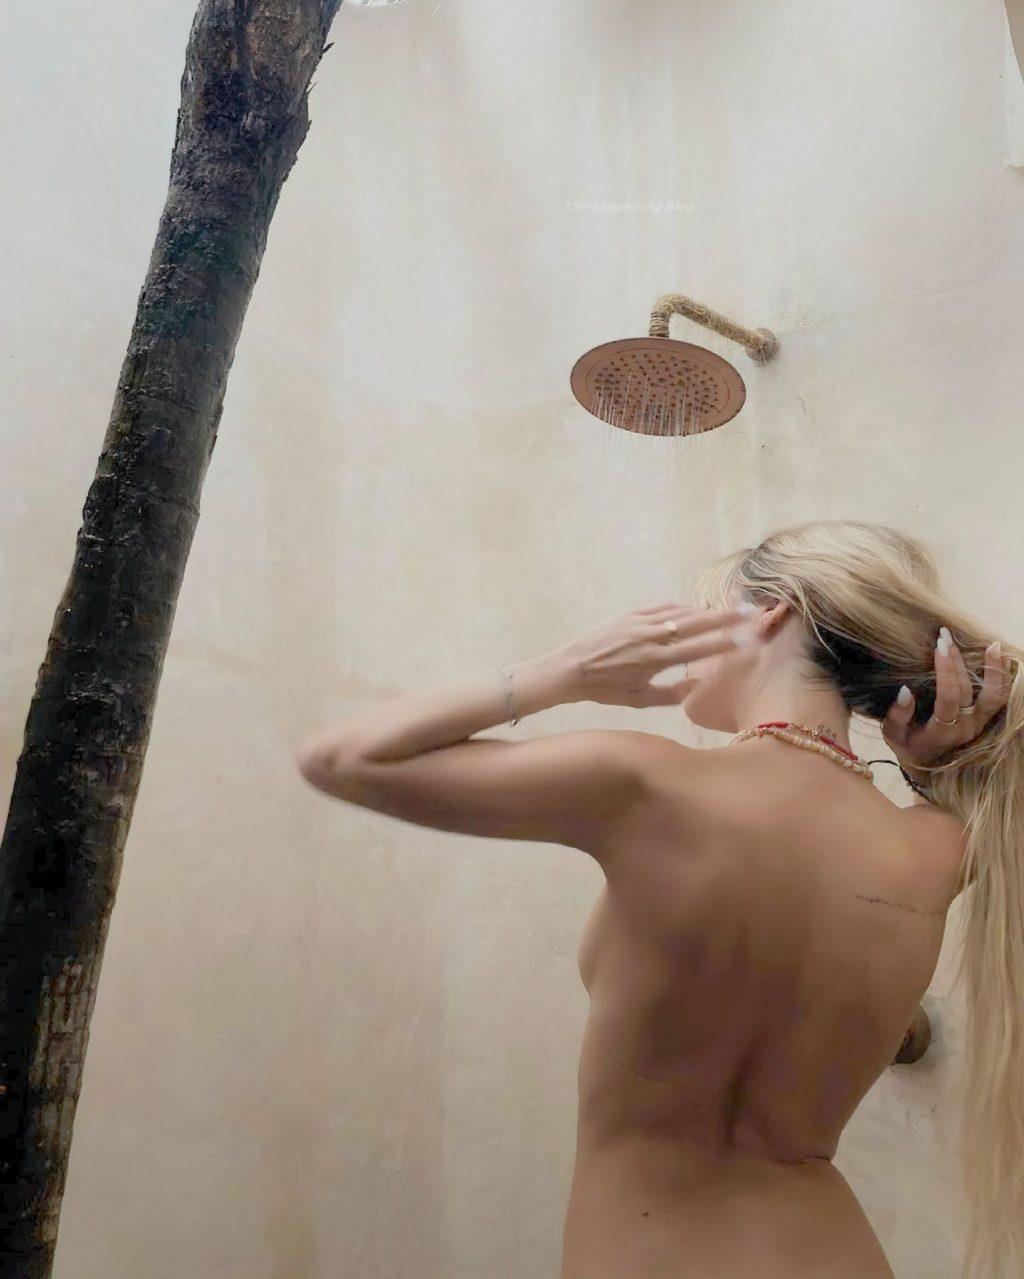 Delilah Belle Hamlin Topless (4 Photos)